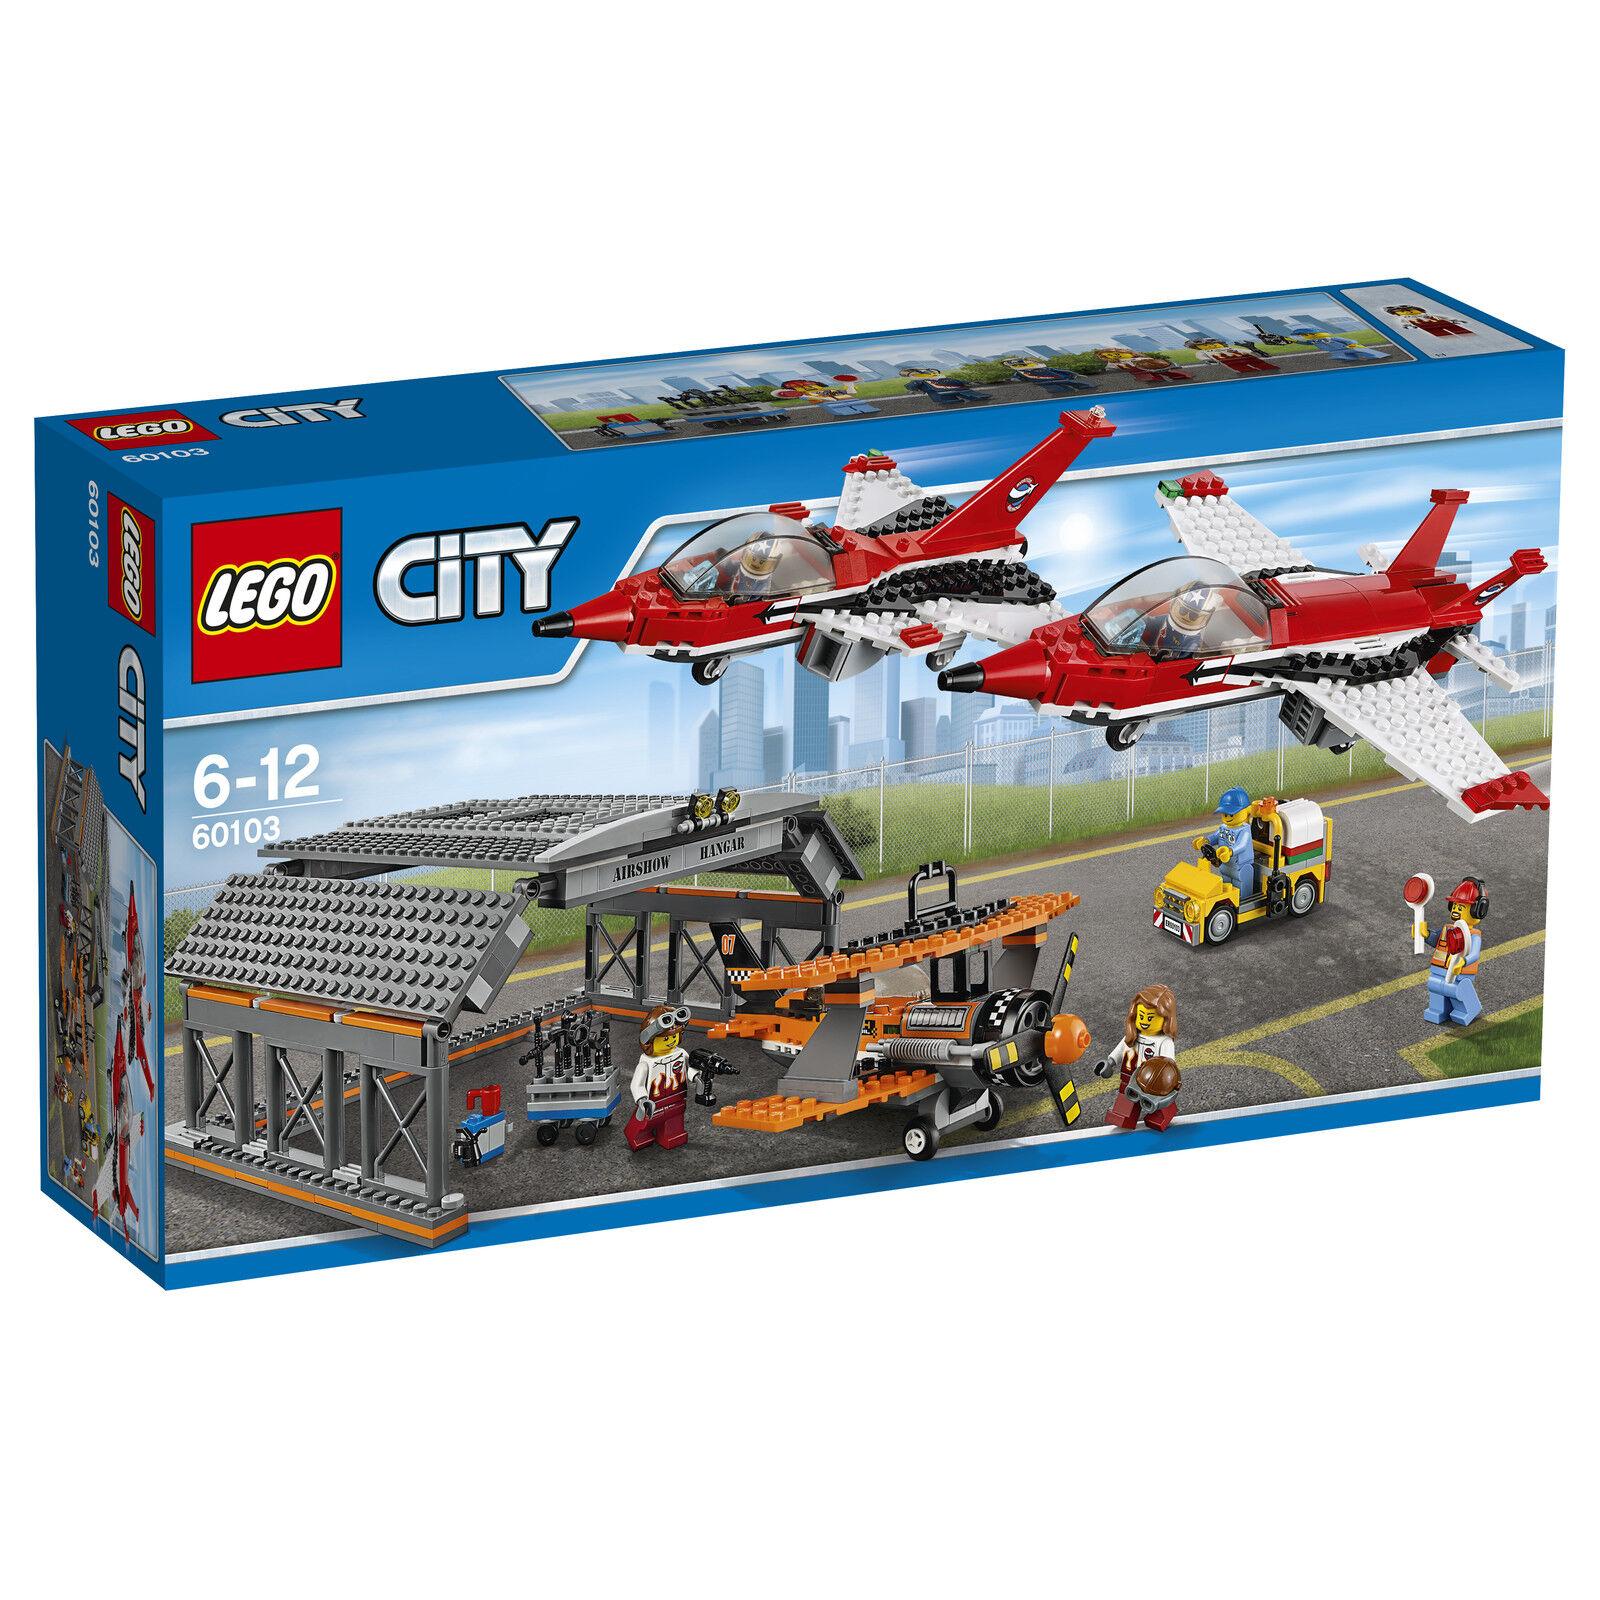 LEGO® City 60103 Große Flugschau NEU OVP_ Airport Air Show NEW MISB NRFB